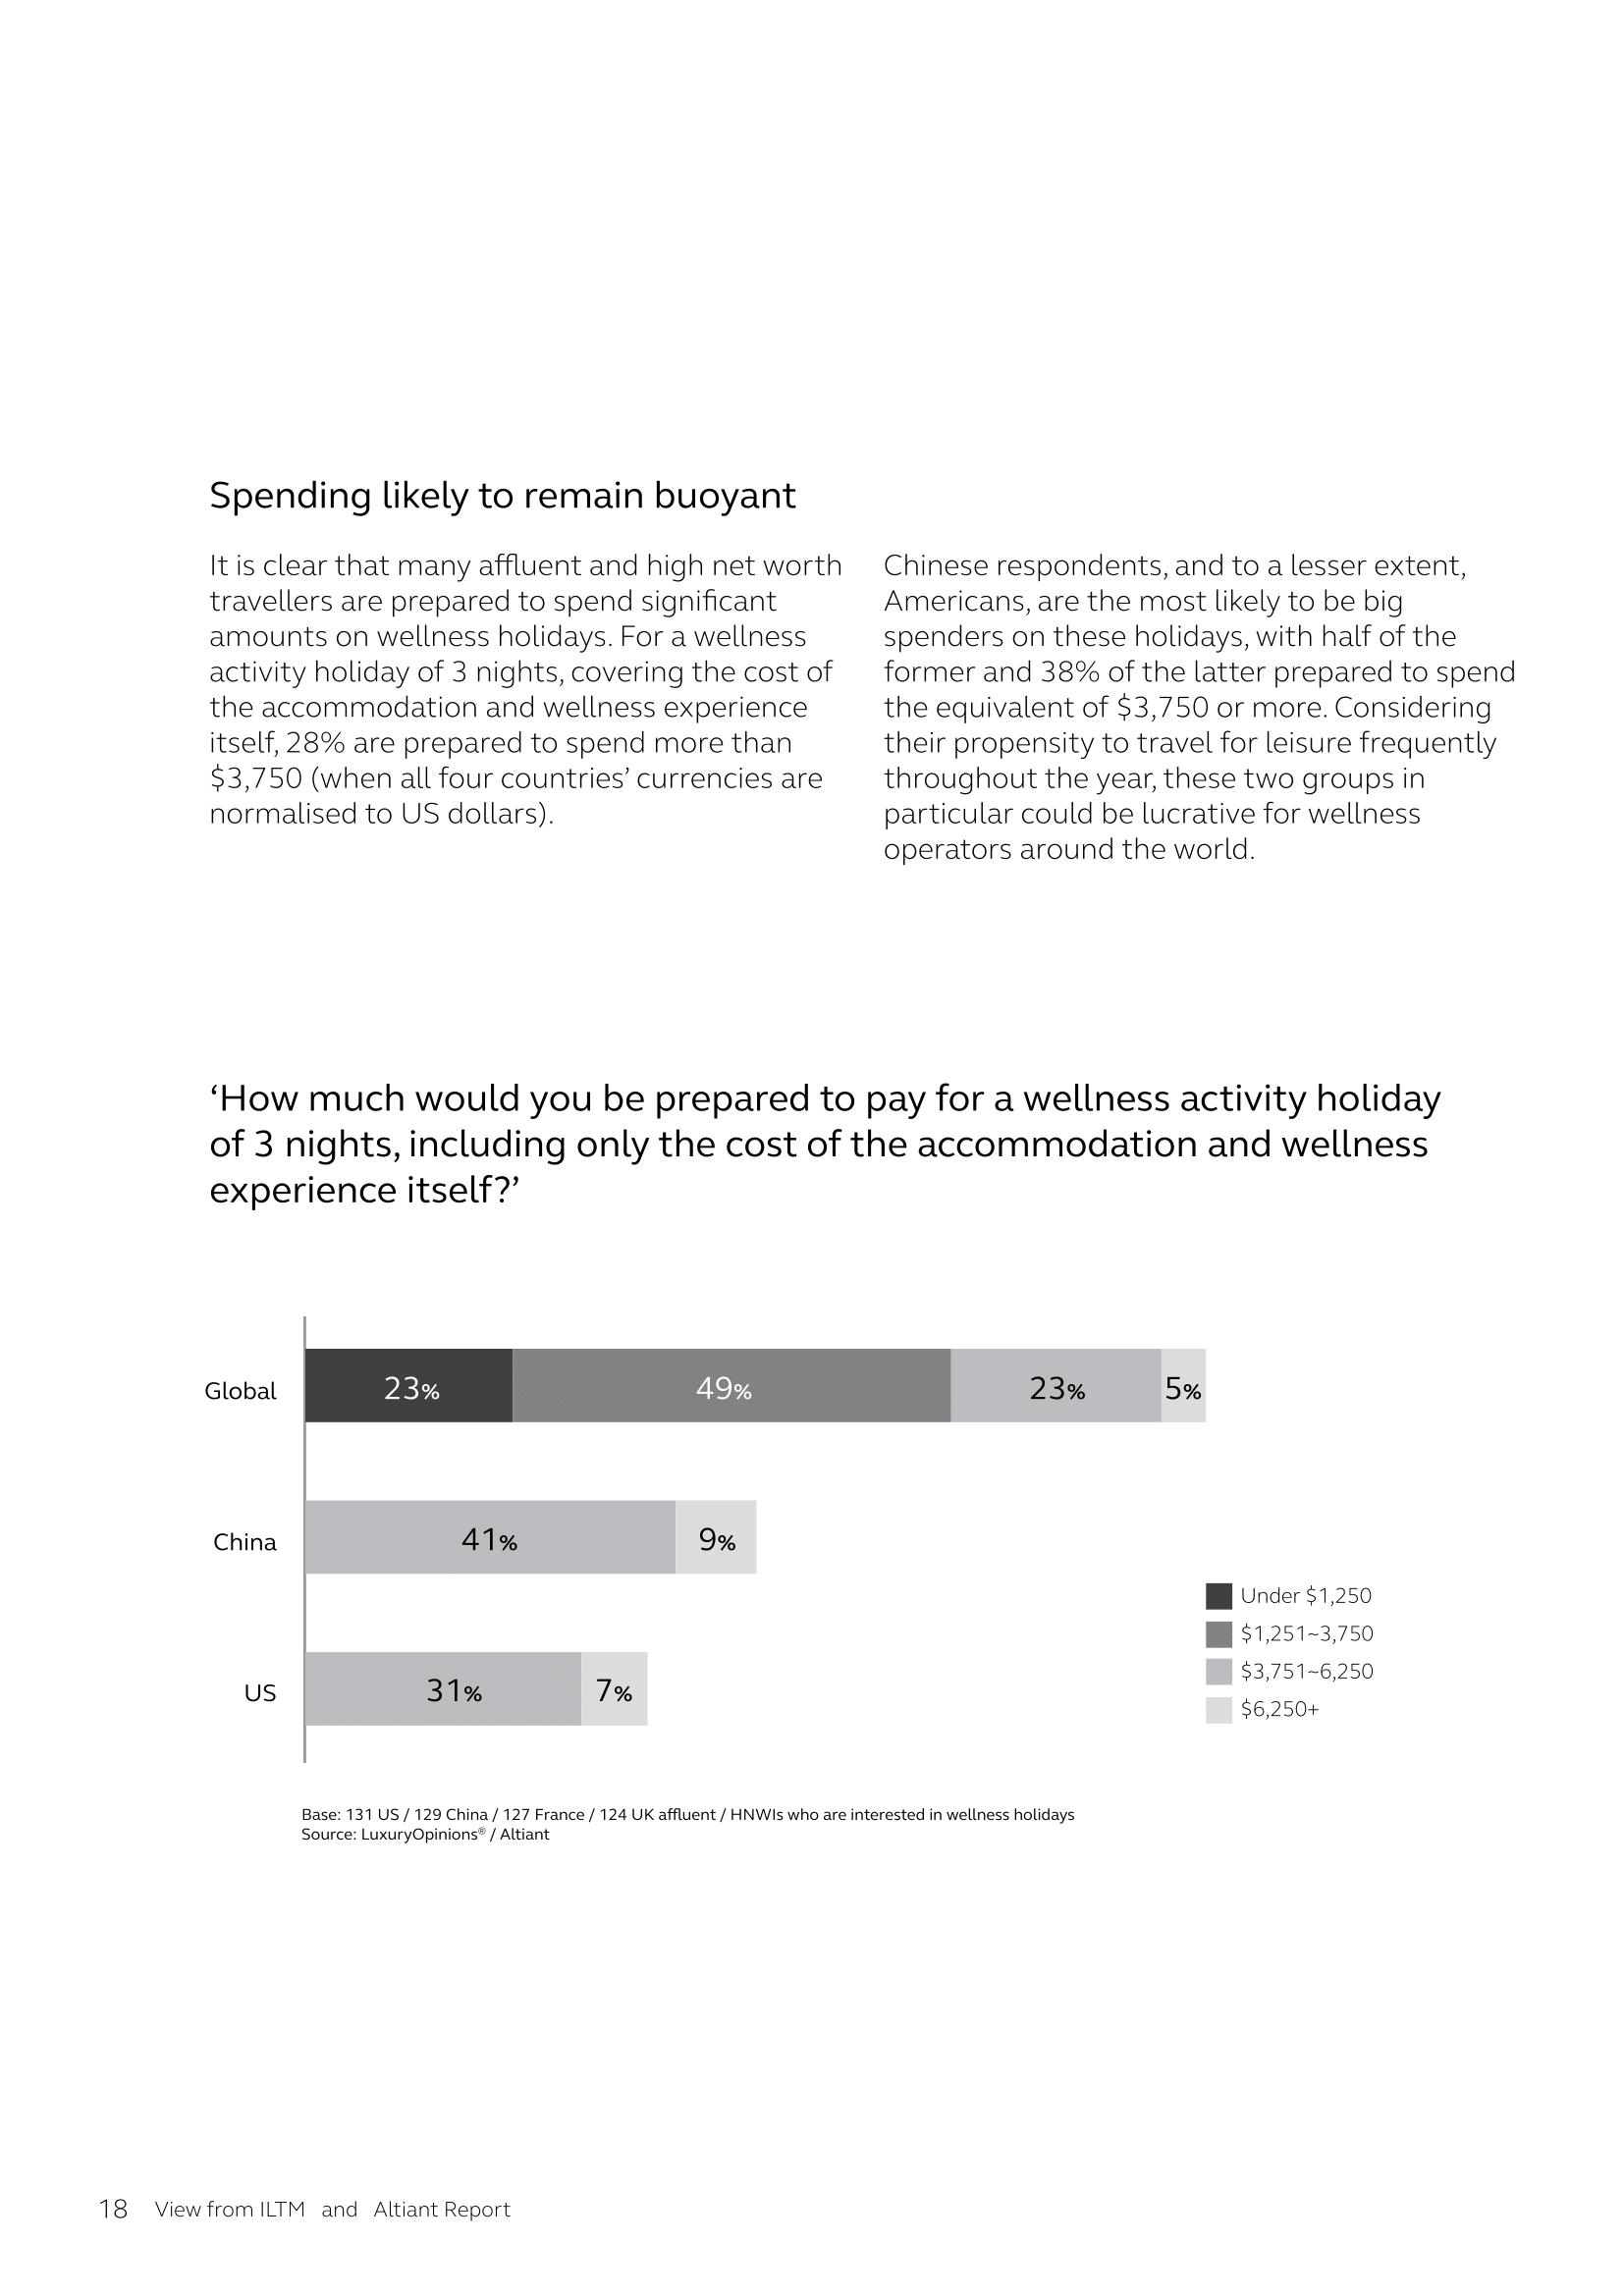 ILTM_Altiant_Report-18.png